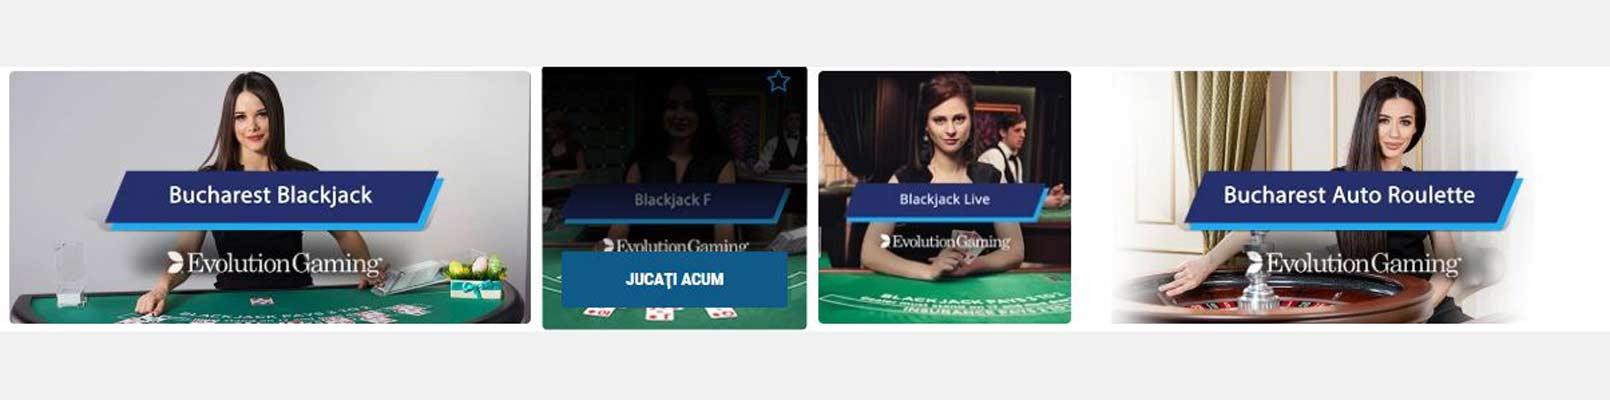 mese live sportingbet casino